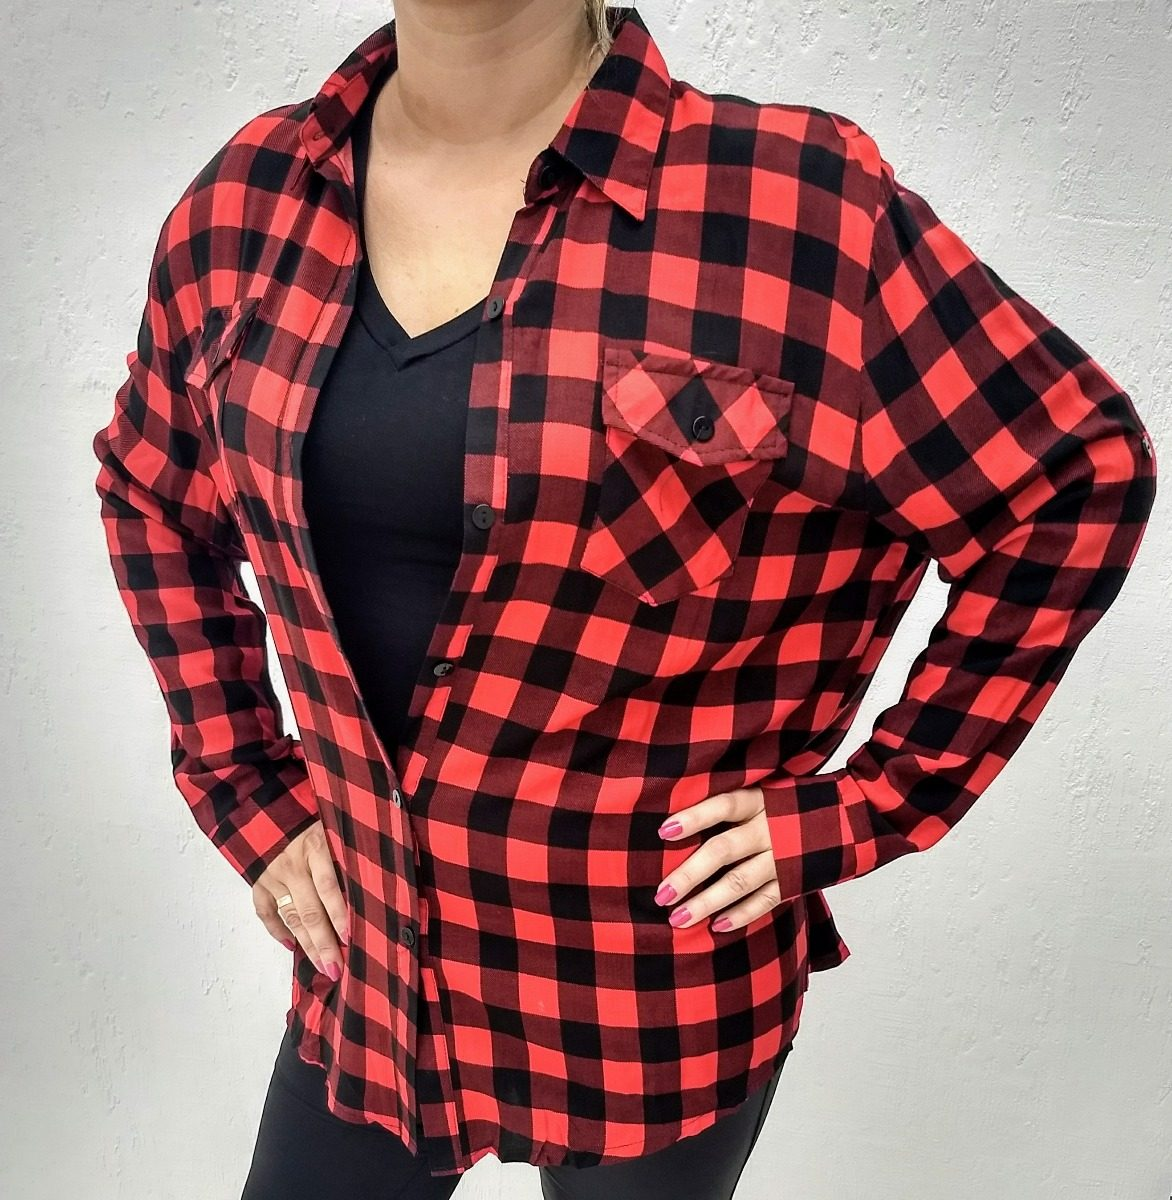 camisa feminina xadrez plus size g1 g2 g3 quadriculada. Carregando zoom. baea637a749